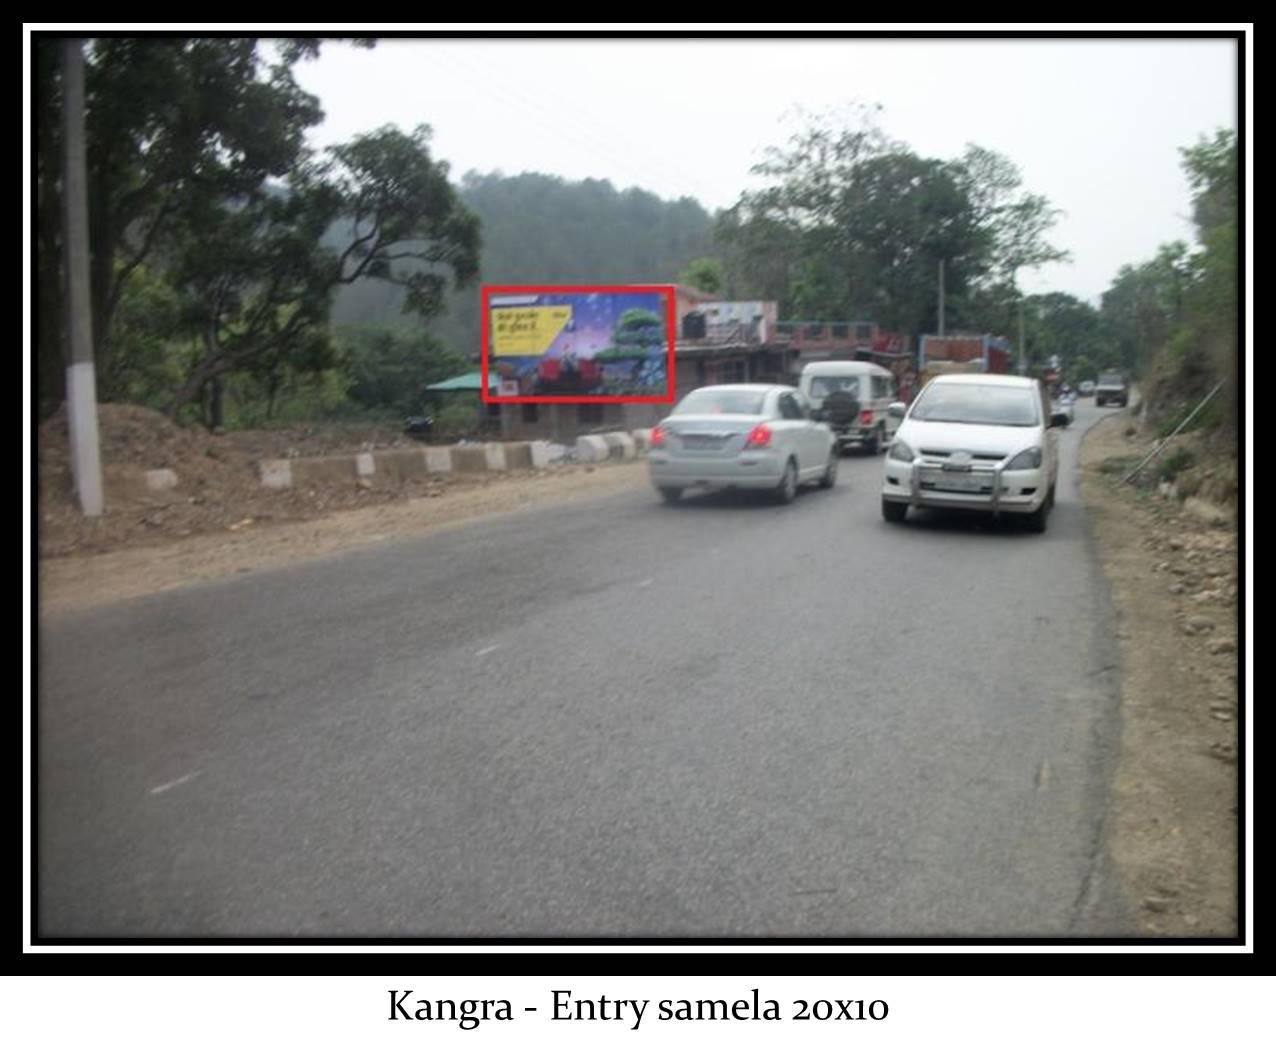 Entry samela, Kangra